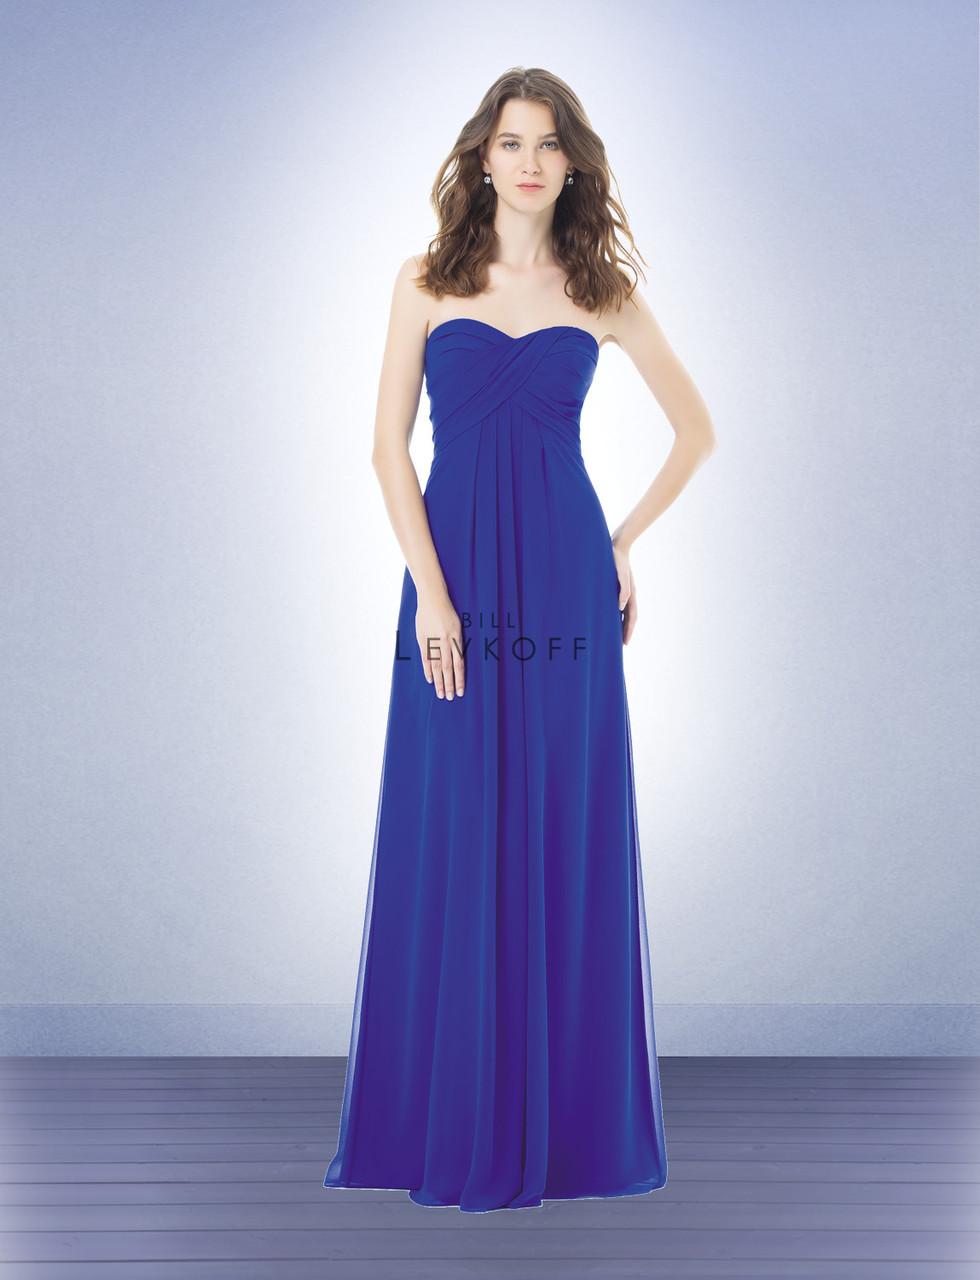 Bill Levkoff Bridesmaid Dress Style 482 - Chiffon